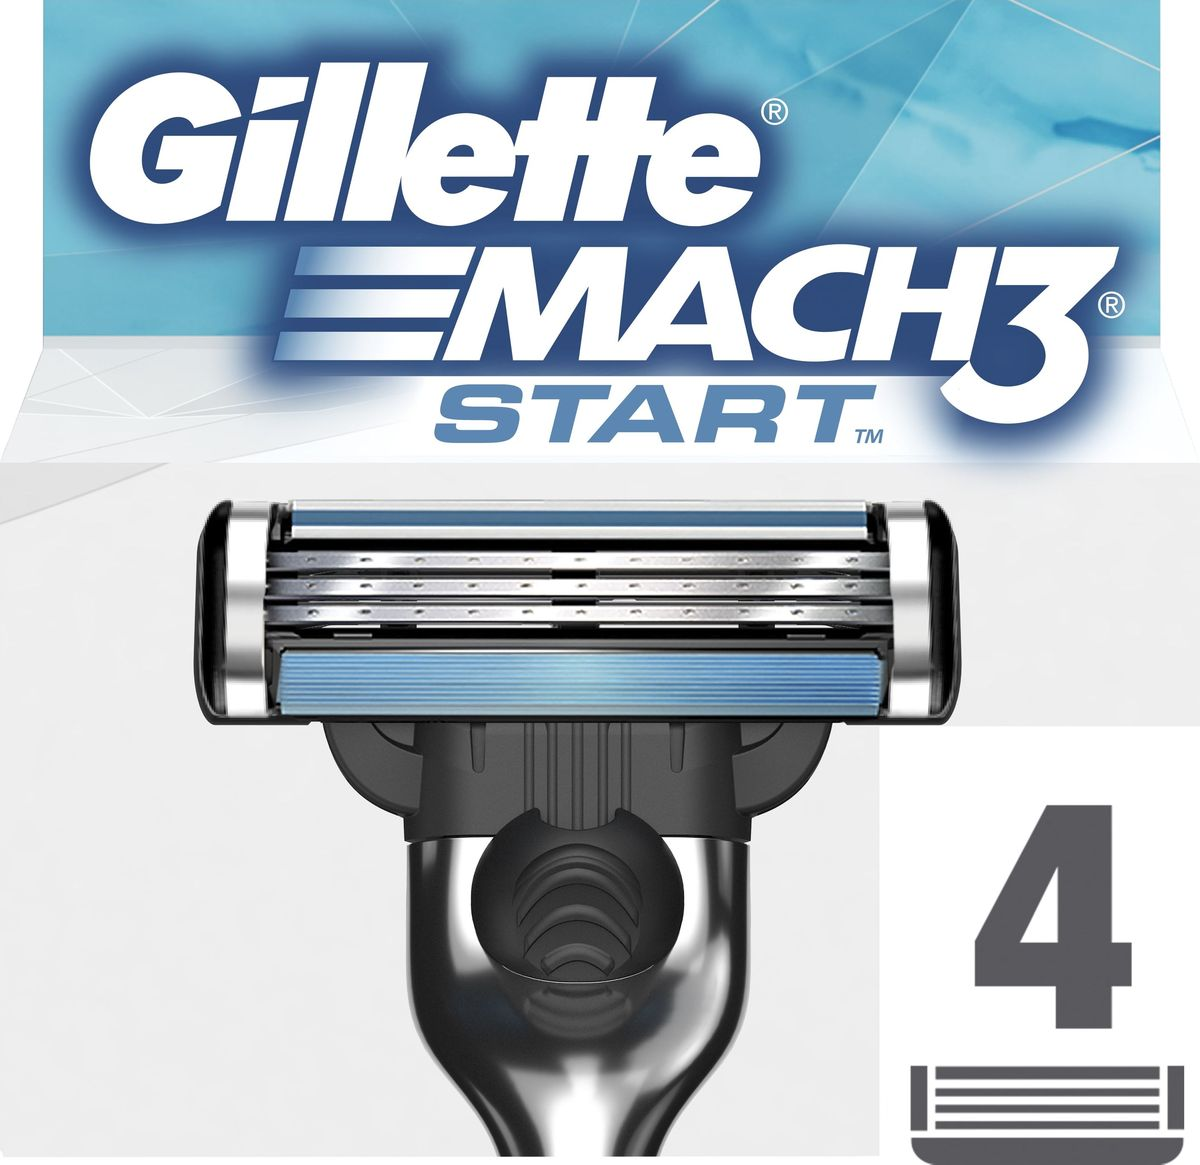 Gillette Mach 3 Start Сменные кассеты для бритвы, 4 шт cменные кассеты для бритья mach 3 gillette 4 шт